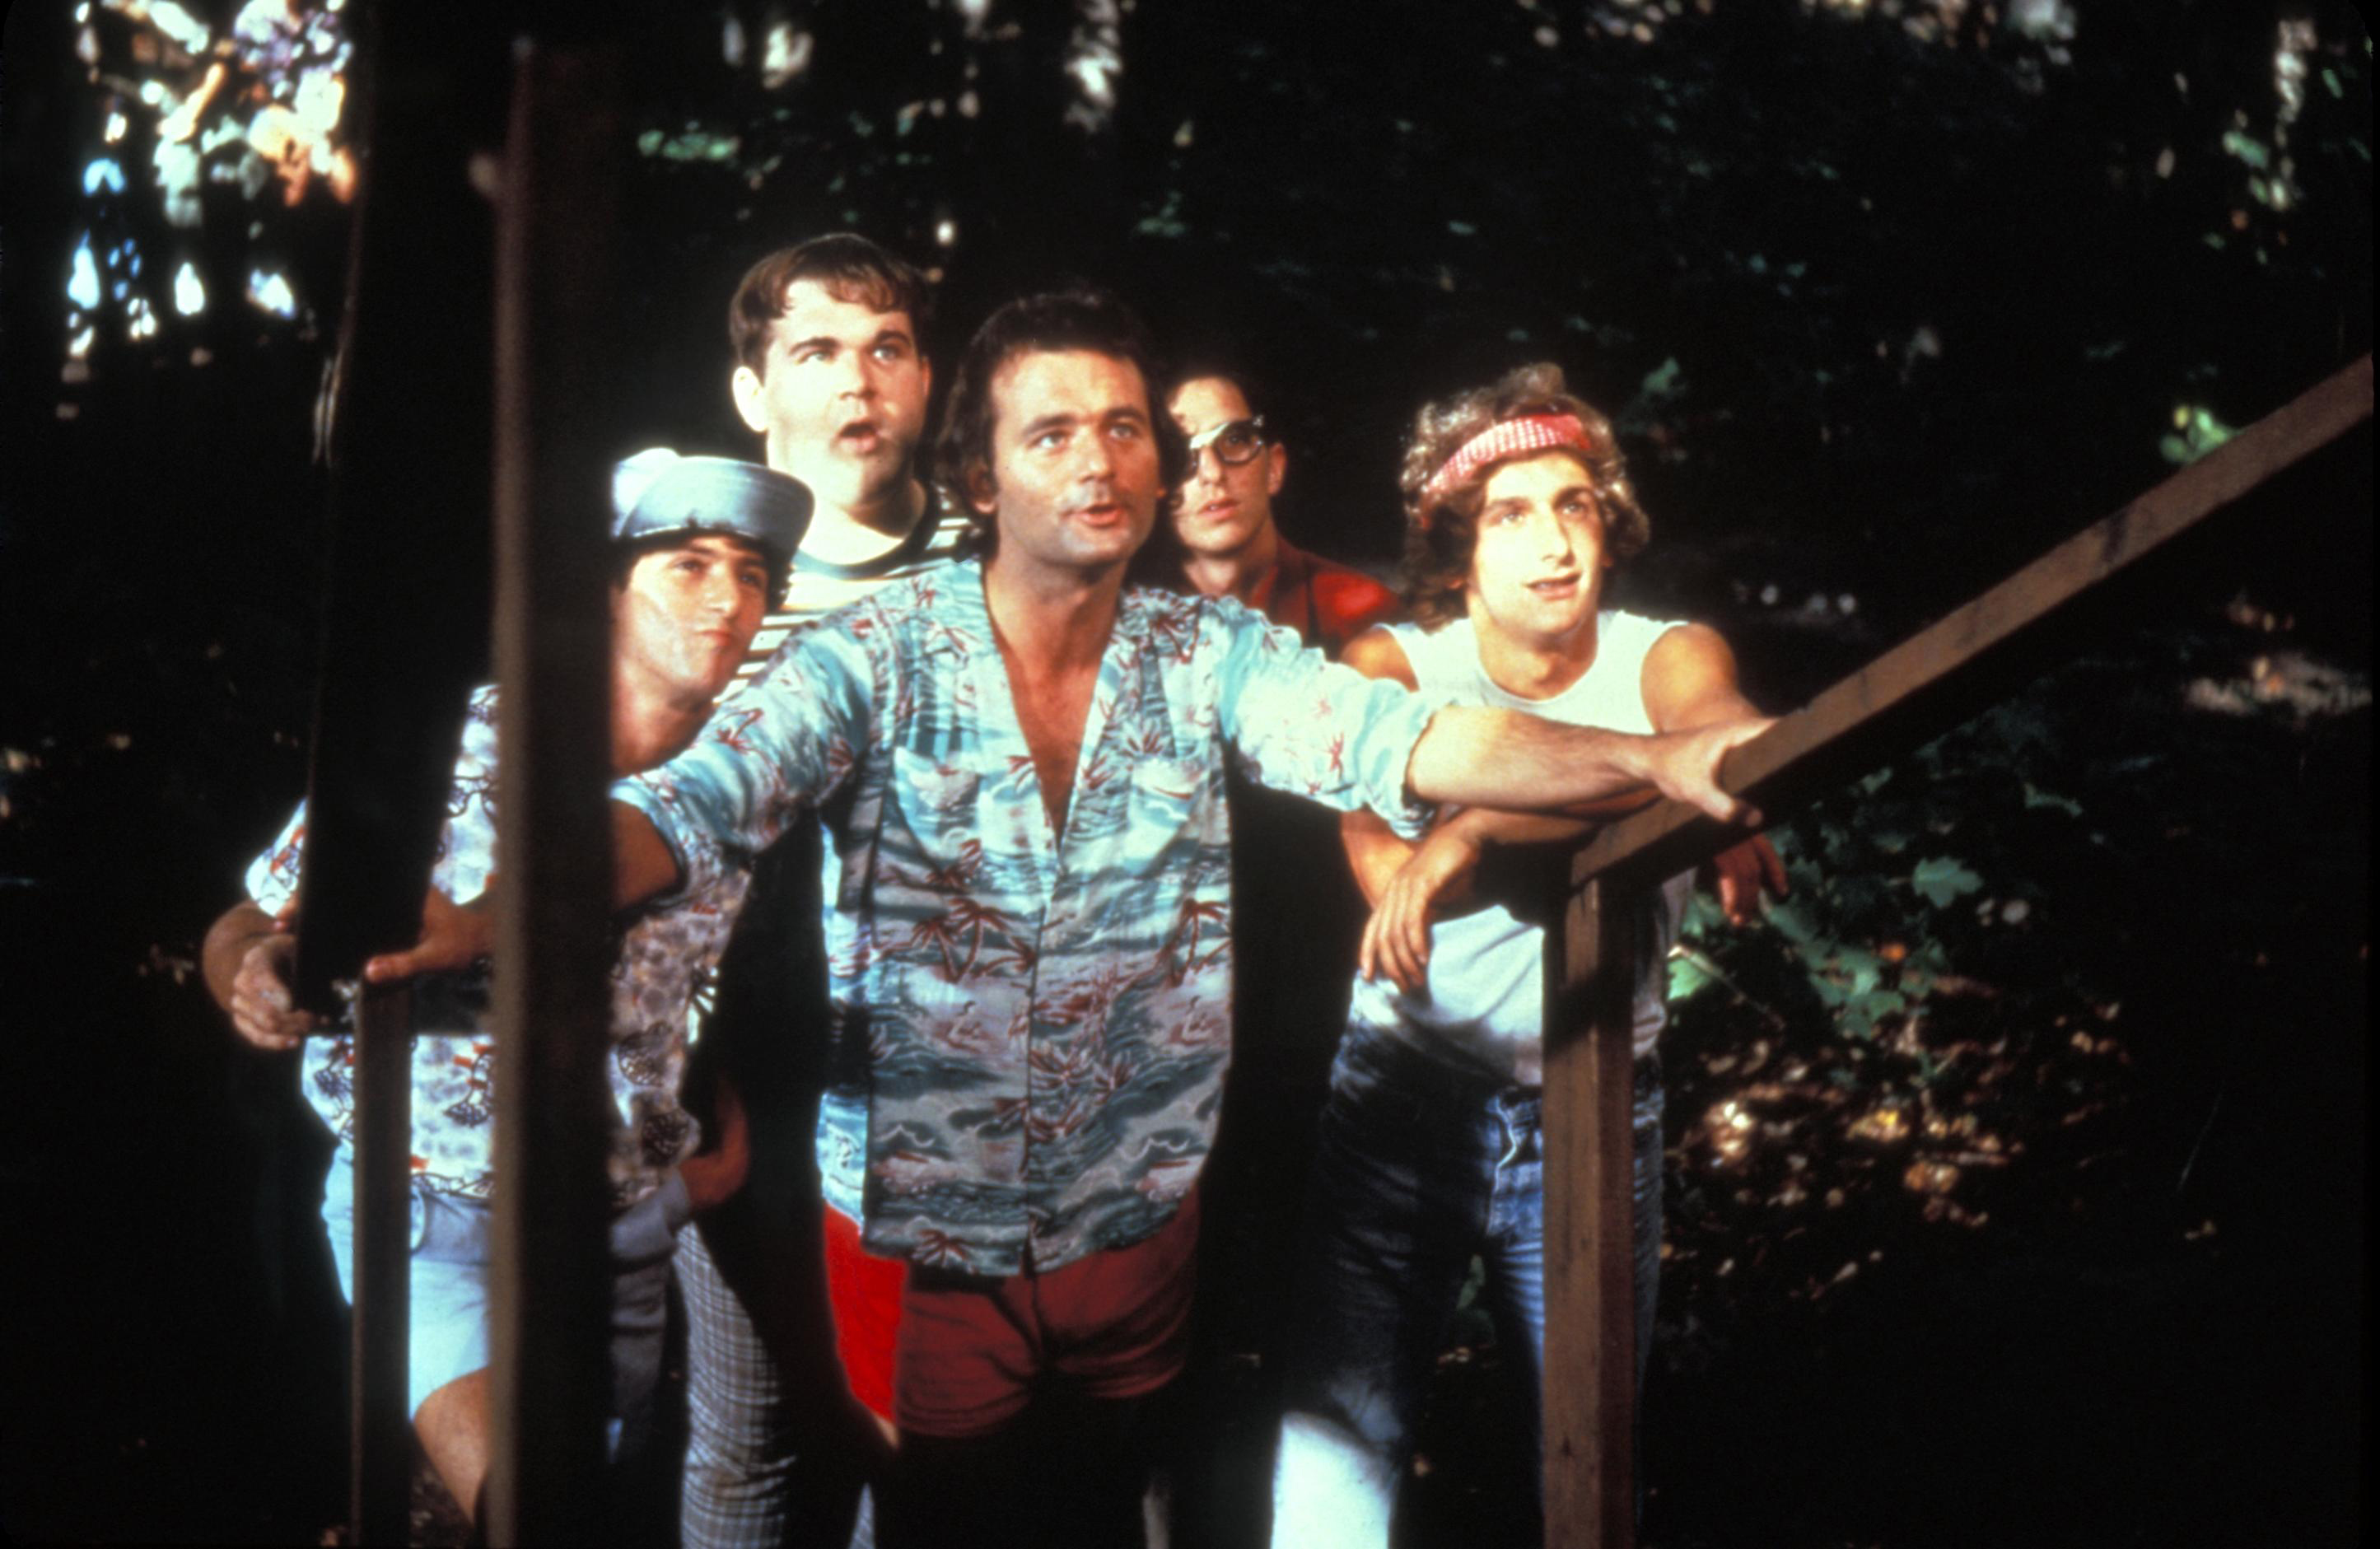 1672cee9186 Meatballs (1979) - Photo Gallery - IMDb